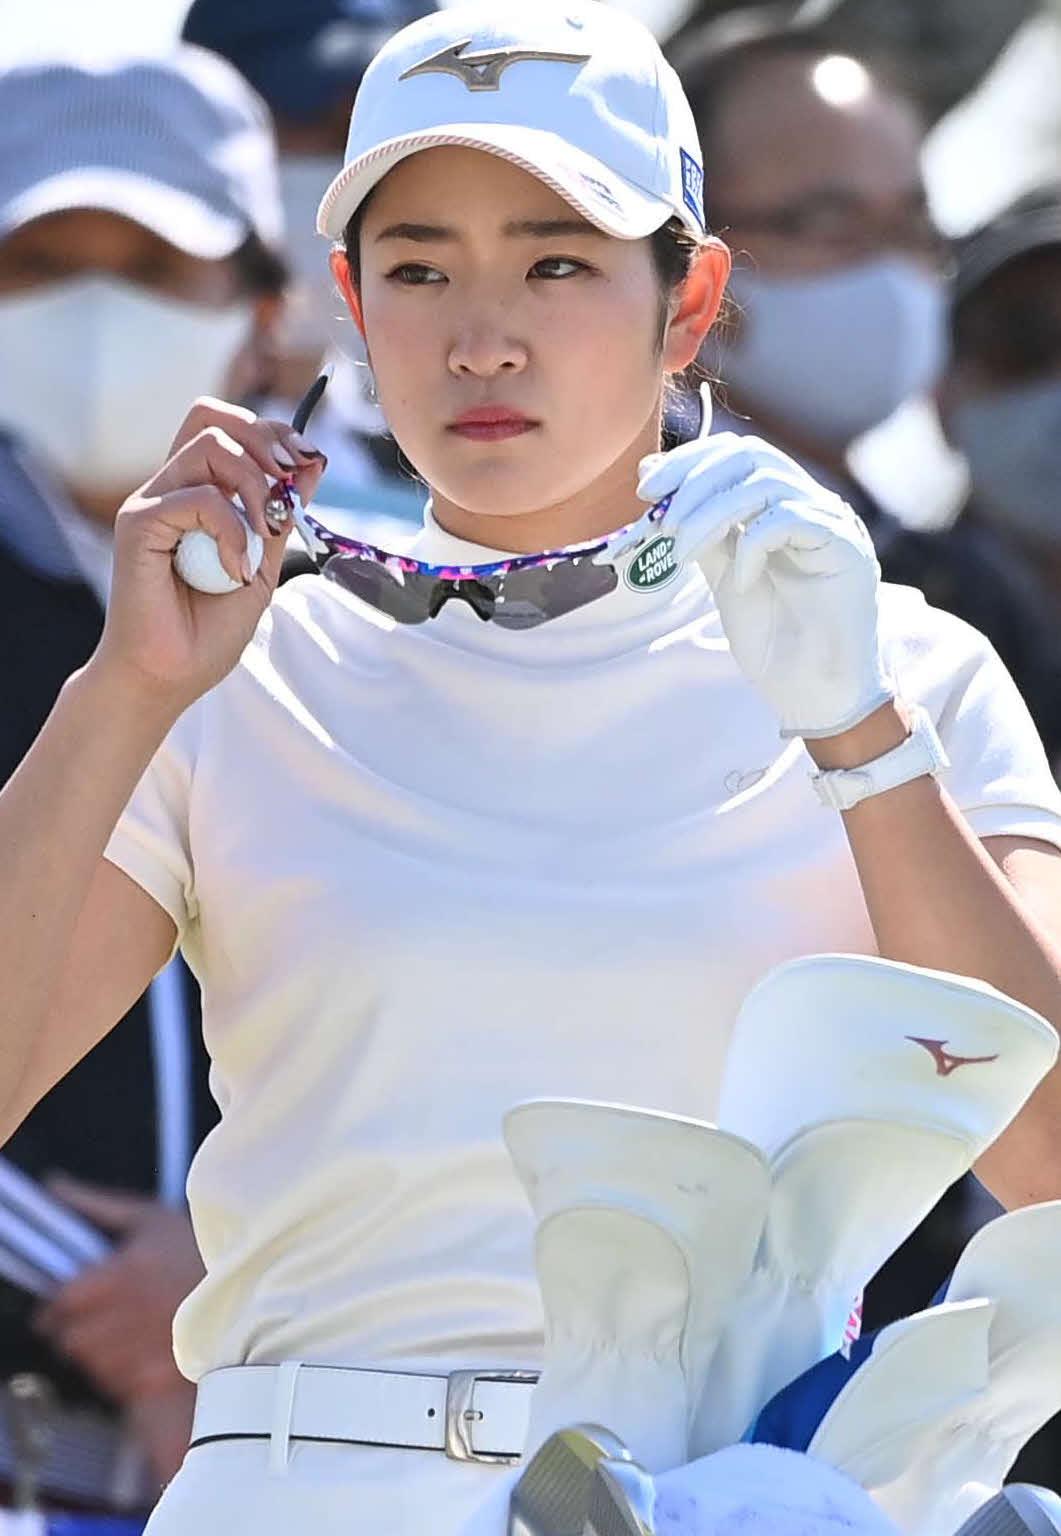 https://www.nikkansports.com/sports/golf/news/img/202103260003015-w1300_0.jpg